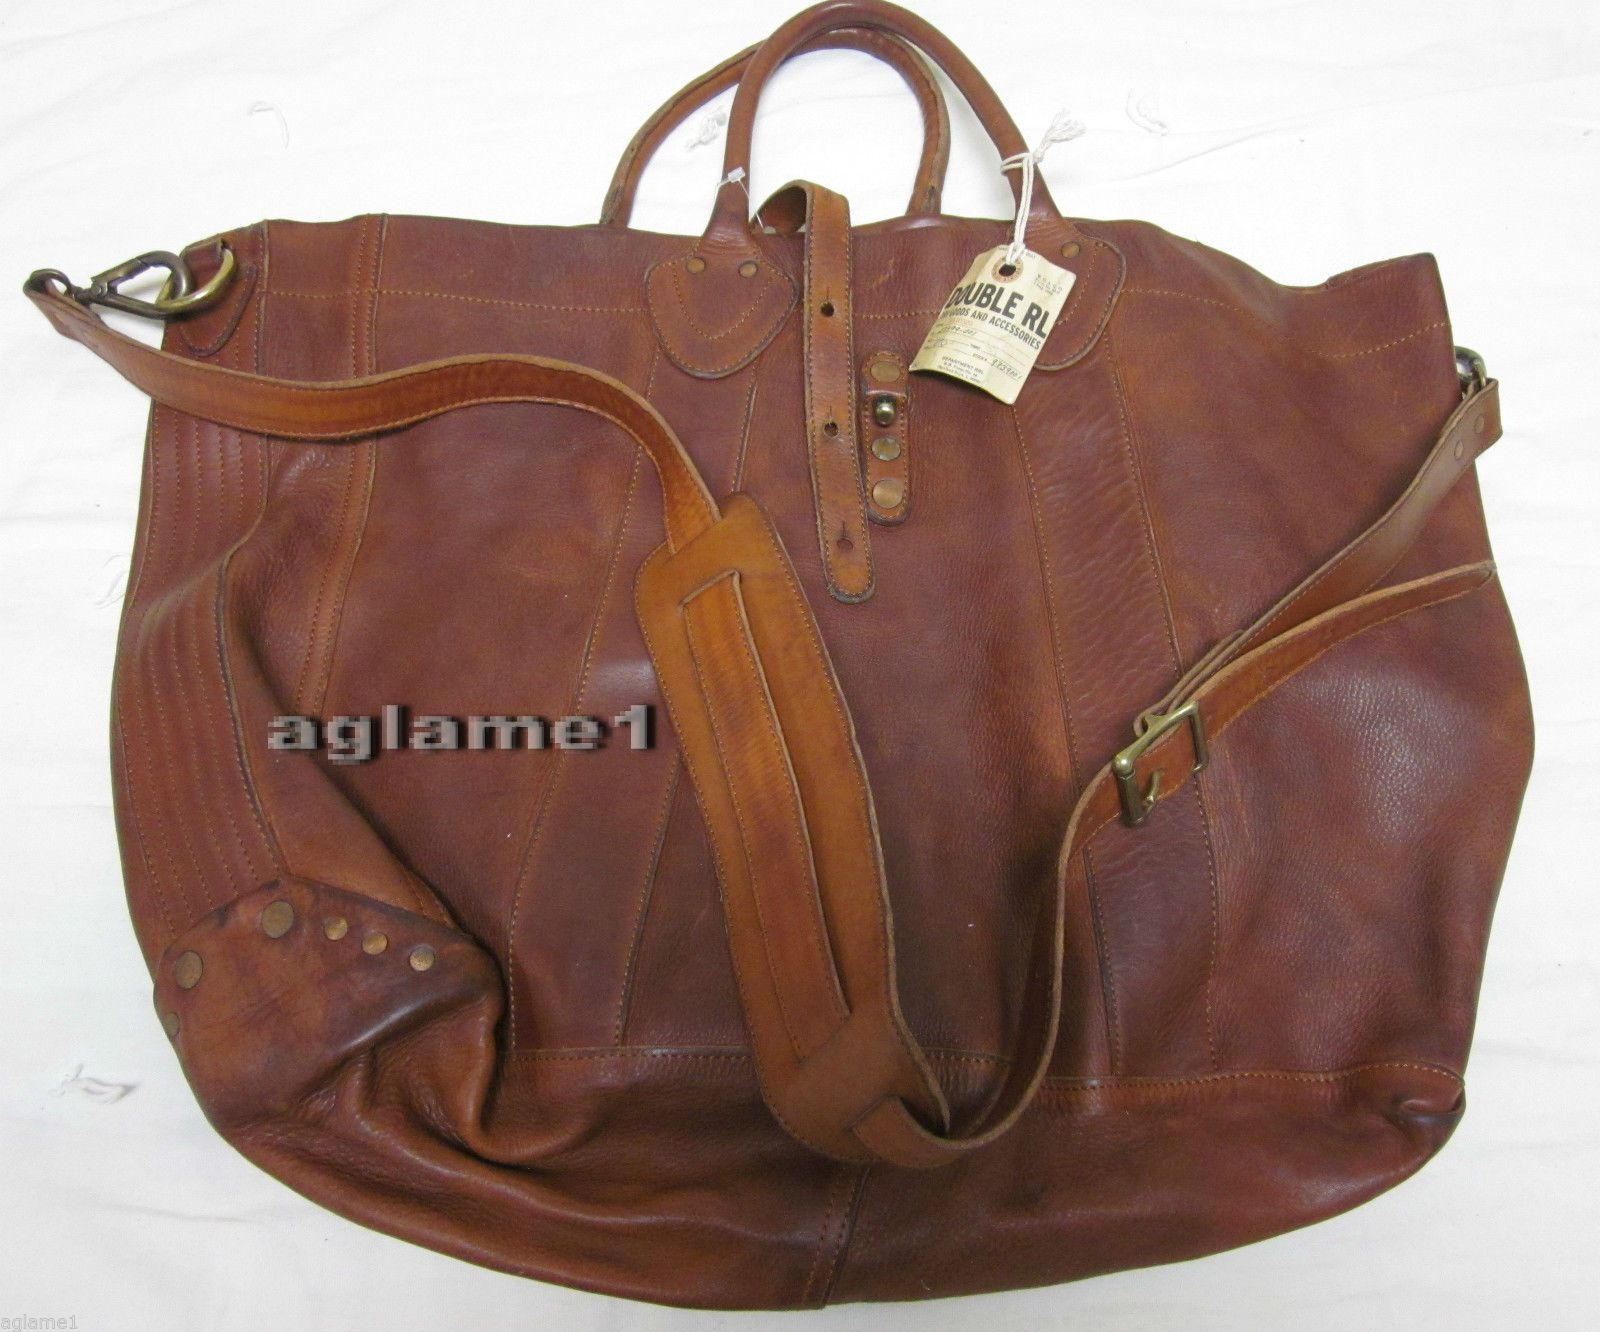 d74d7554b21 Last1 Ralph Lauren Vintage RRL Double RL Distressed Rough Leather Tote Bag  Italy